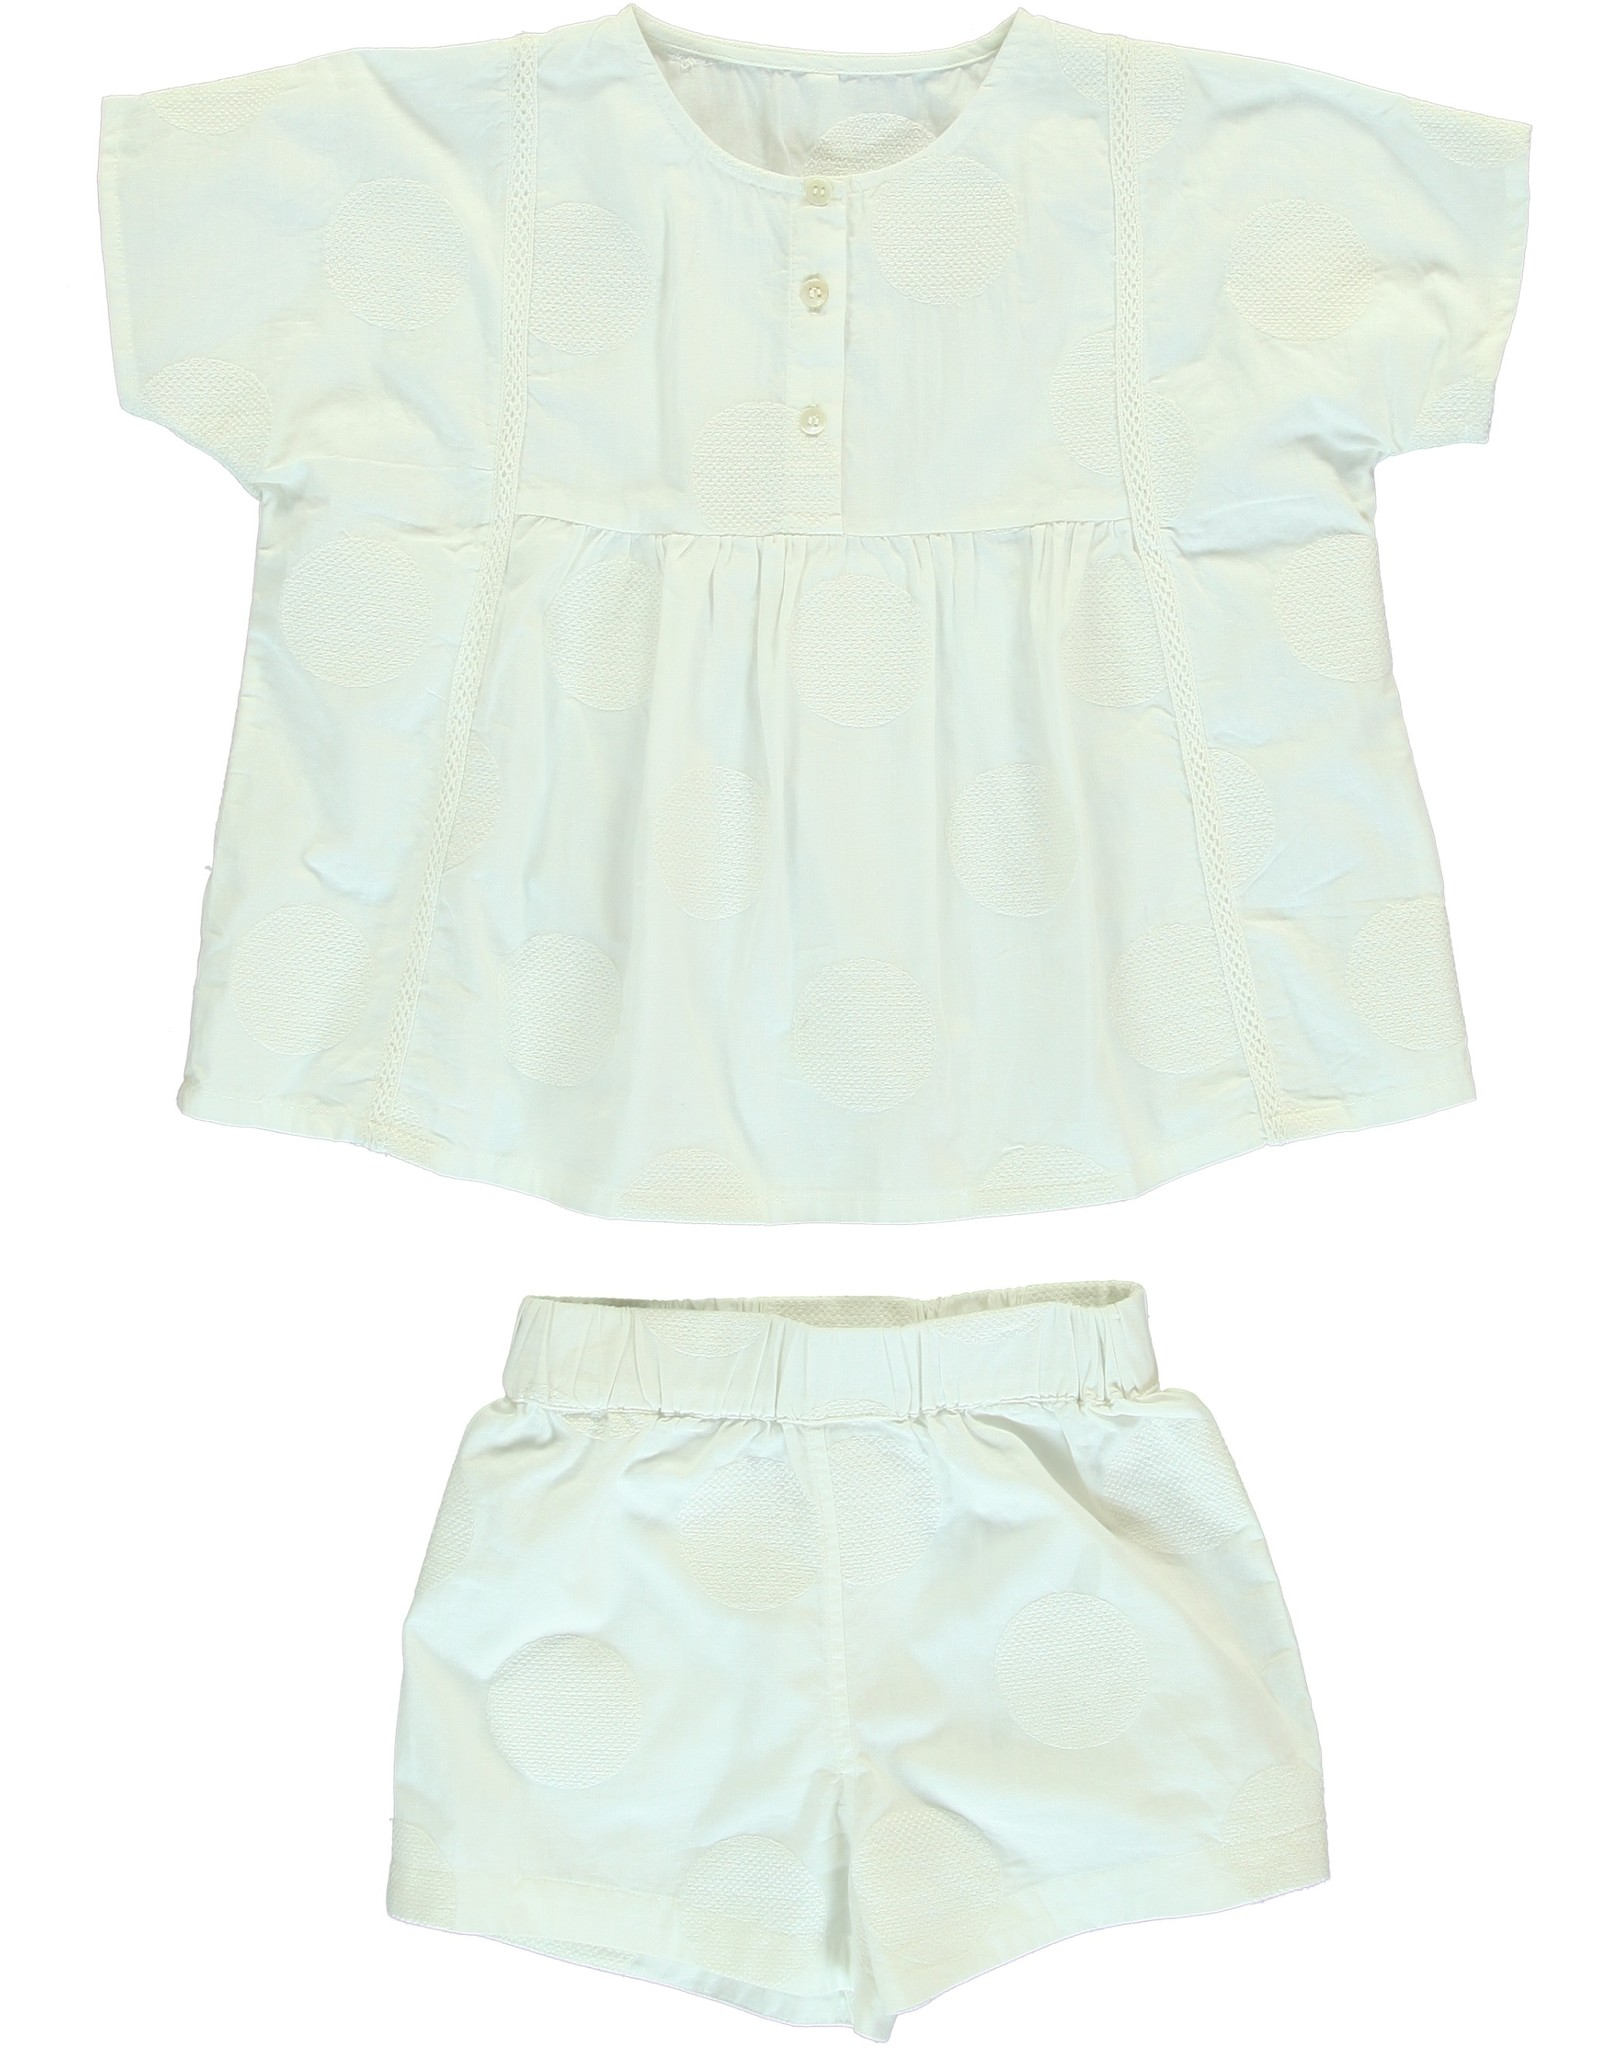 Dorélit Cor & Cupido | Pajama Set Woven | Offwhite